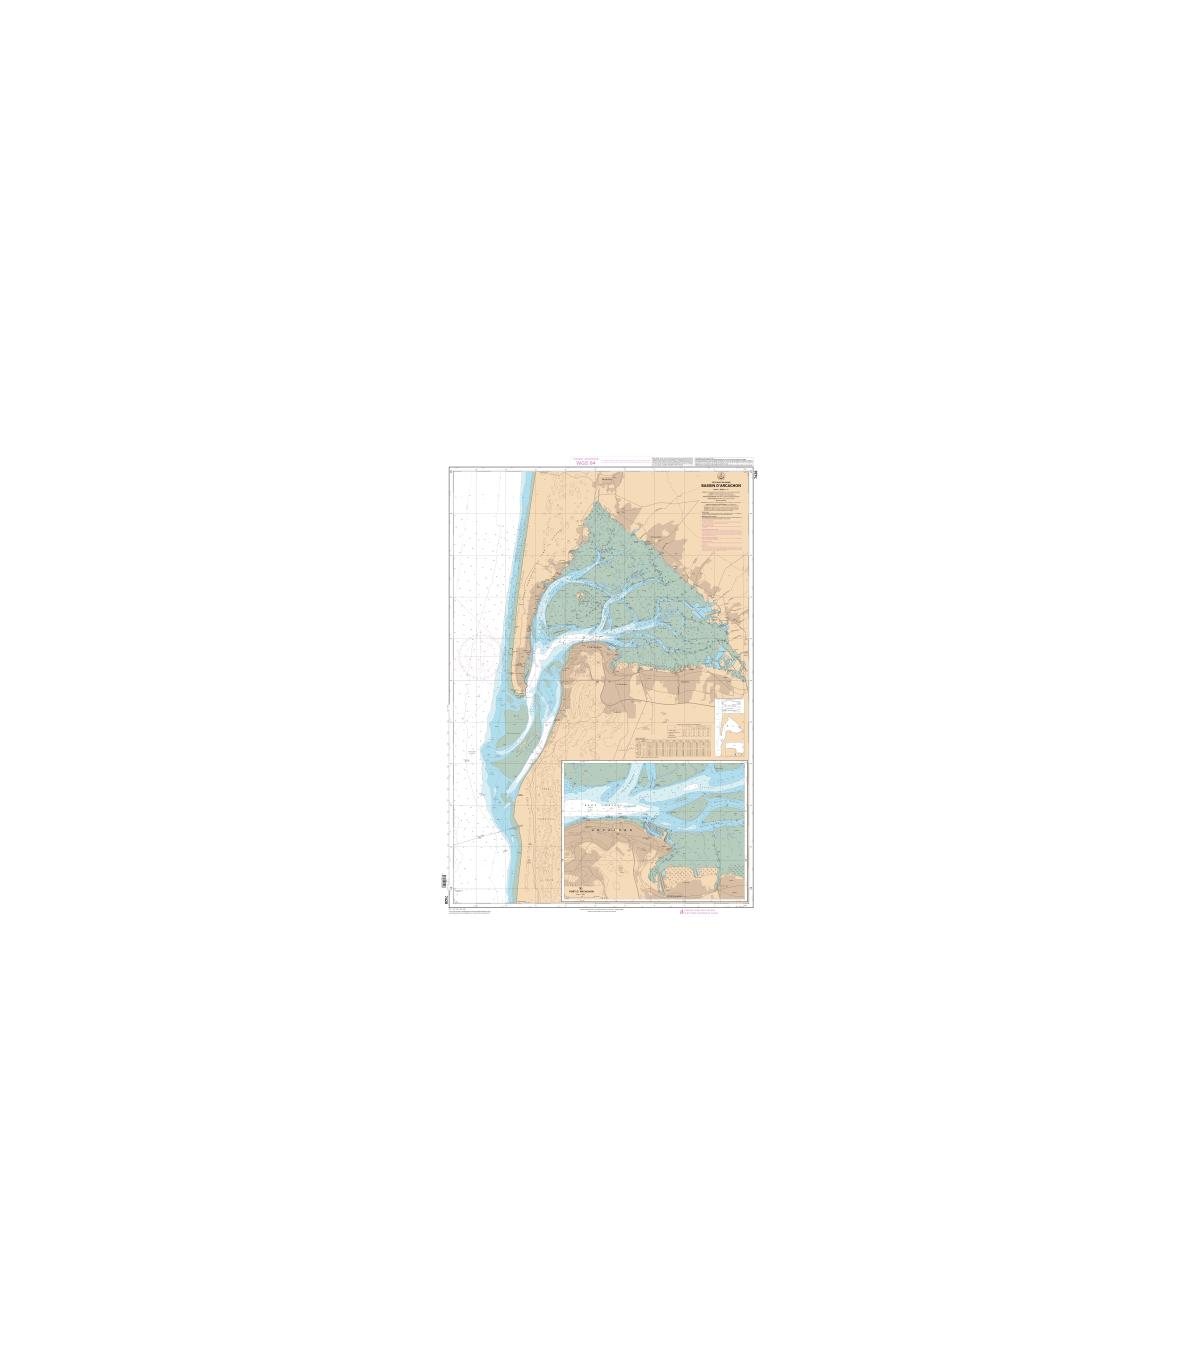 7428 Bassin Darcachon Carte Marine Numérique